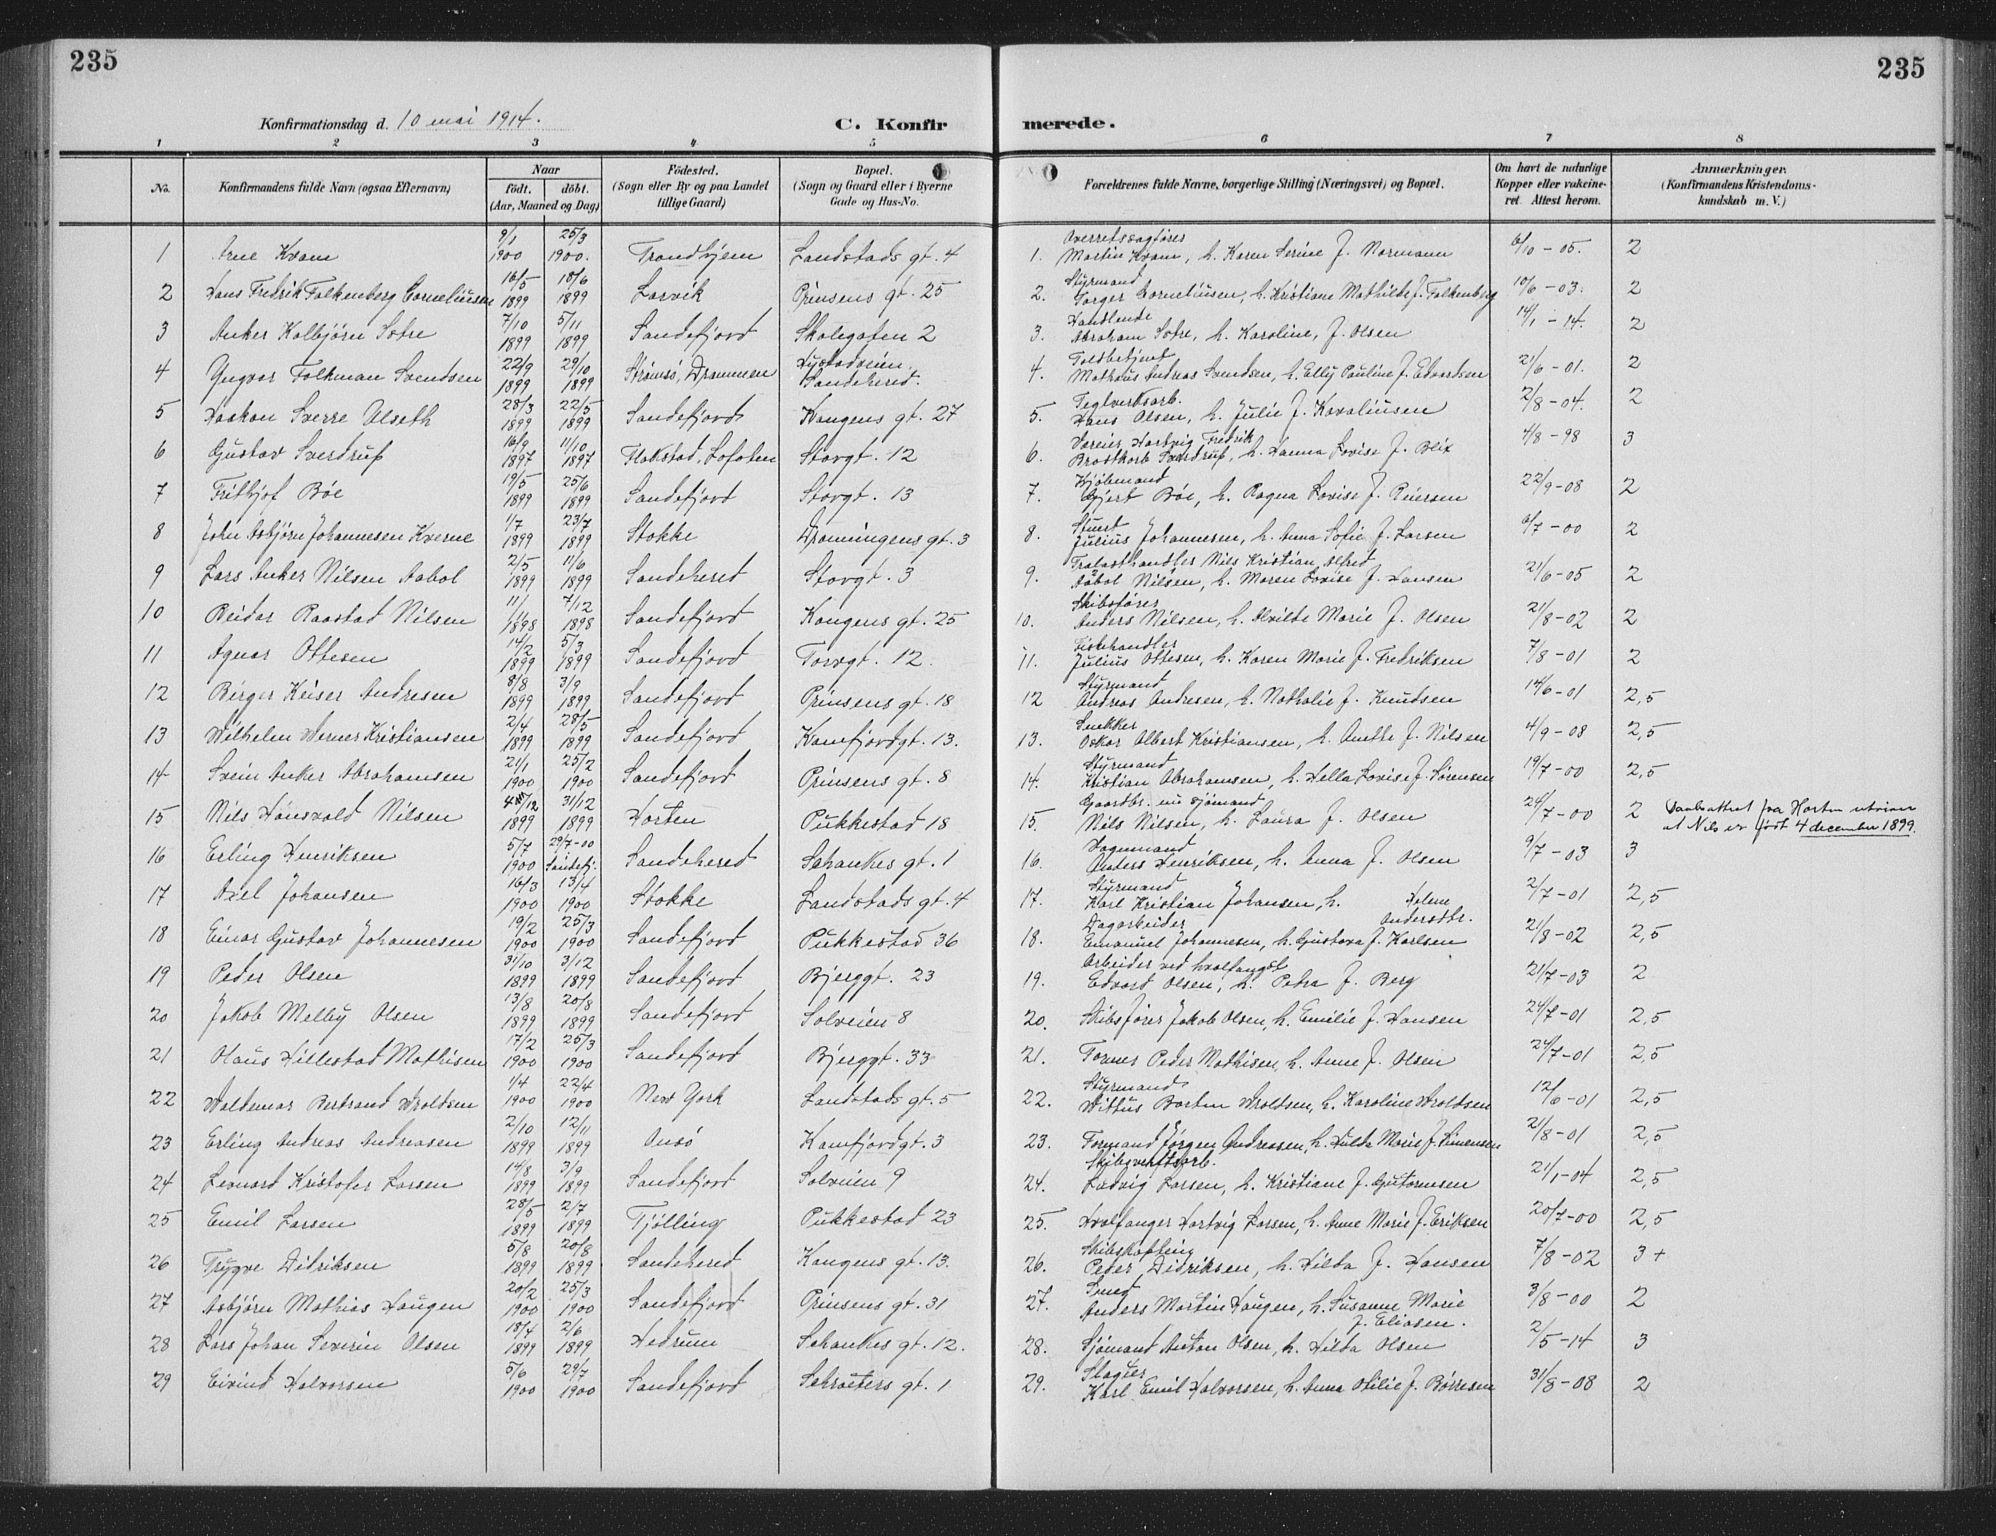 SAKO, Sandefjord kirkebøker, G/Ga/L0003: Parish register (copy) no. 3, 1903-1920, p. 235